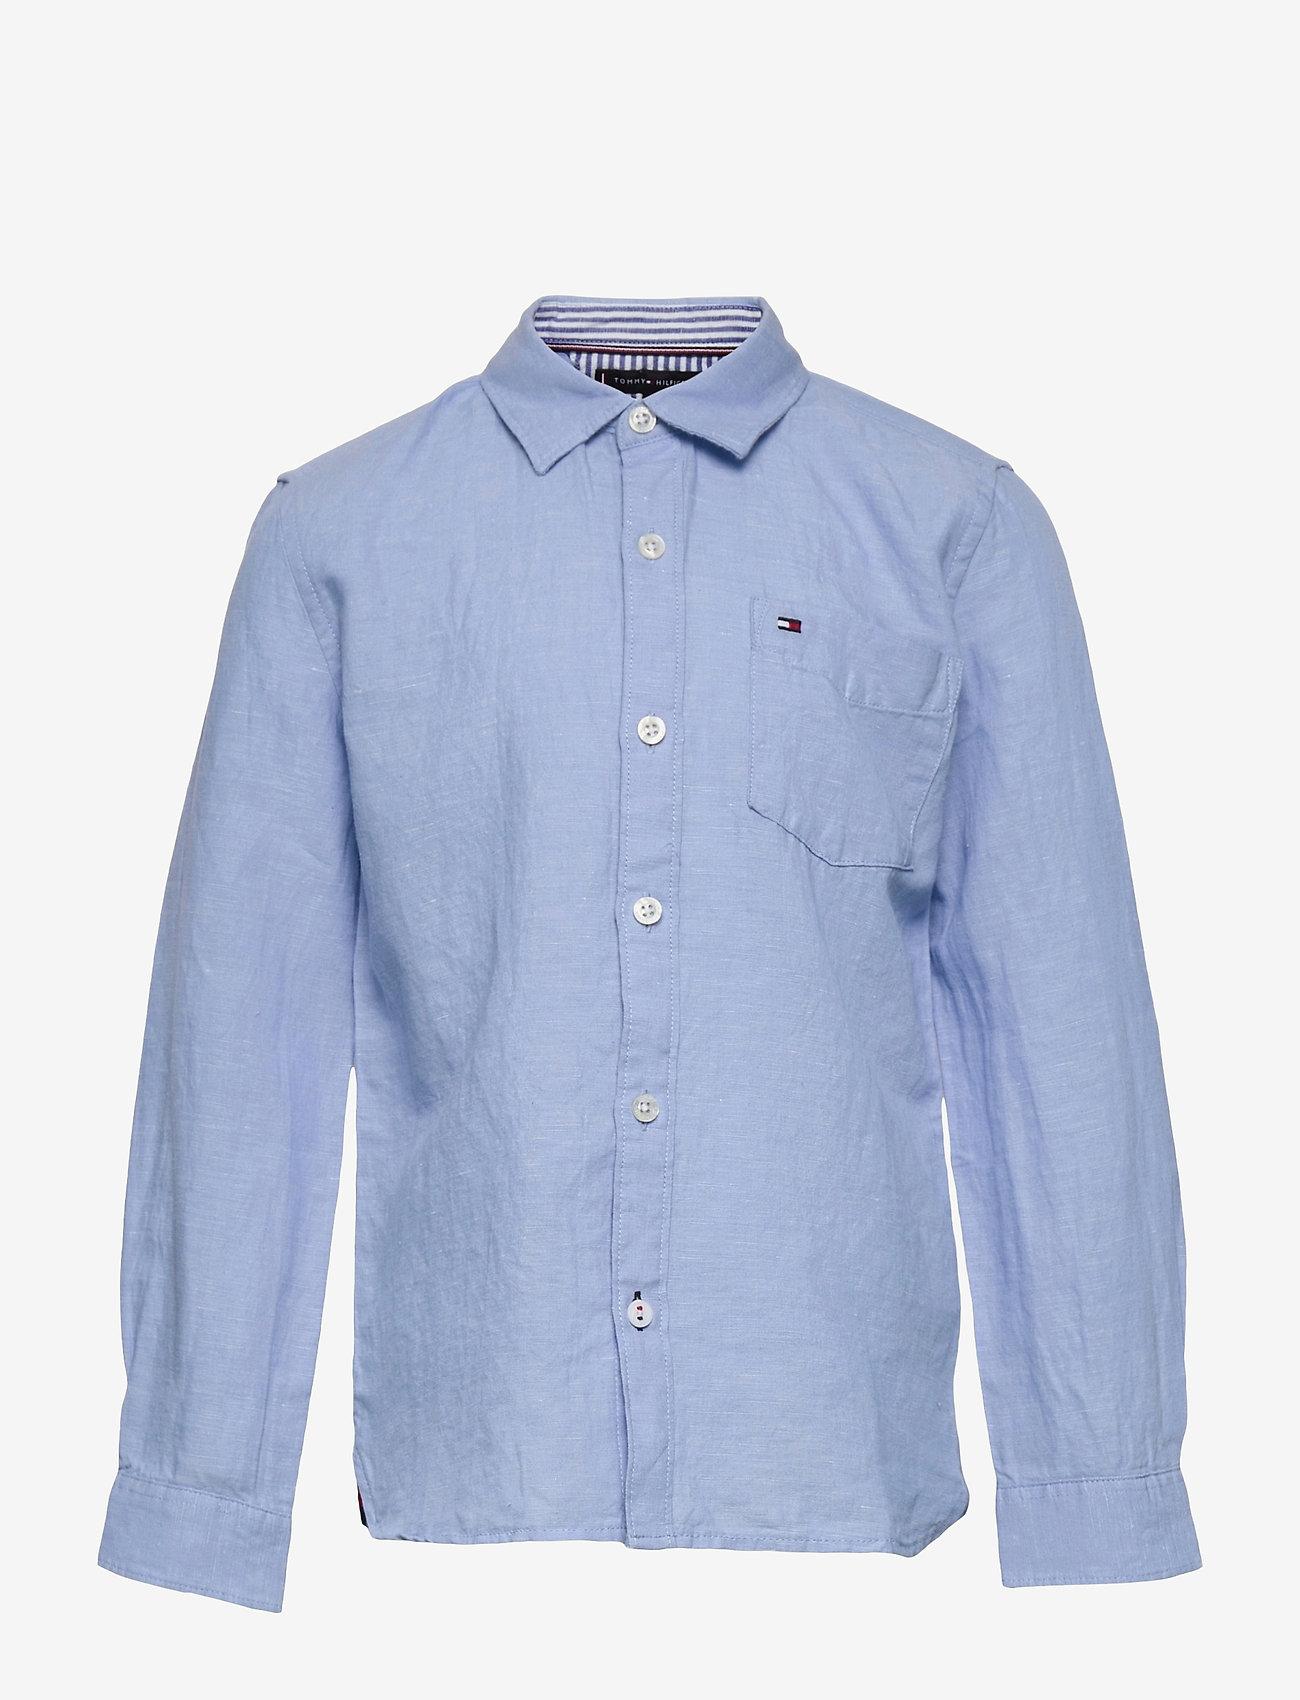 Tommy Hilfiger - ESSENTIAL COTTON LINEN SHIRT L/S - shirts - light blue - 0